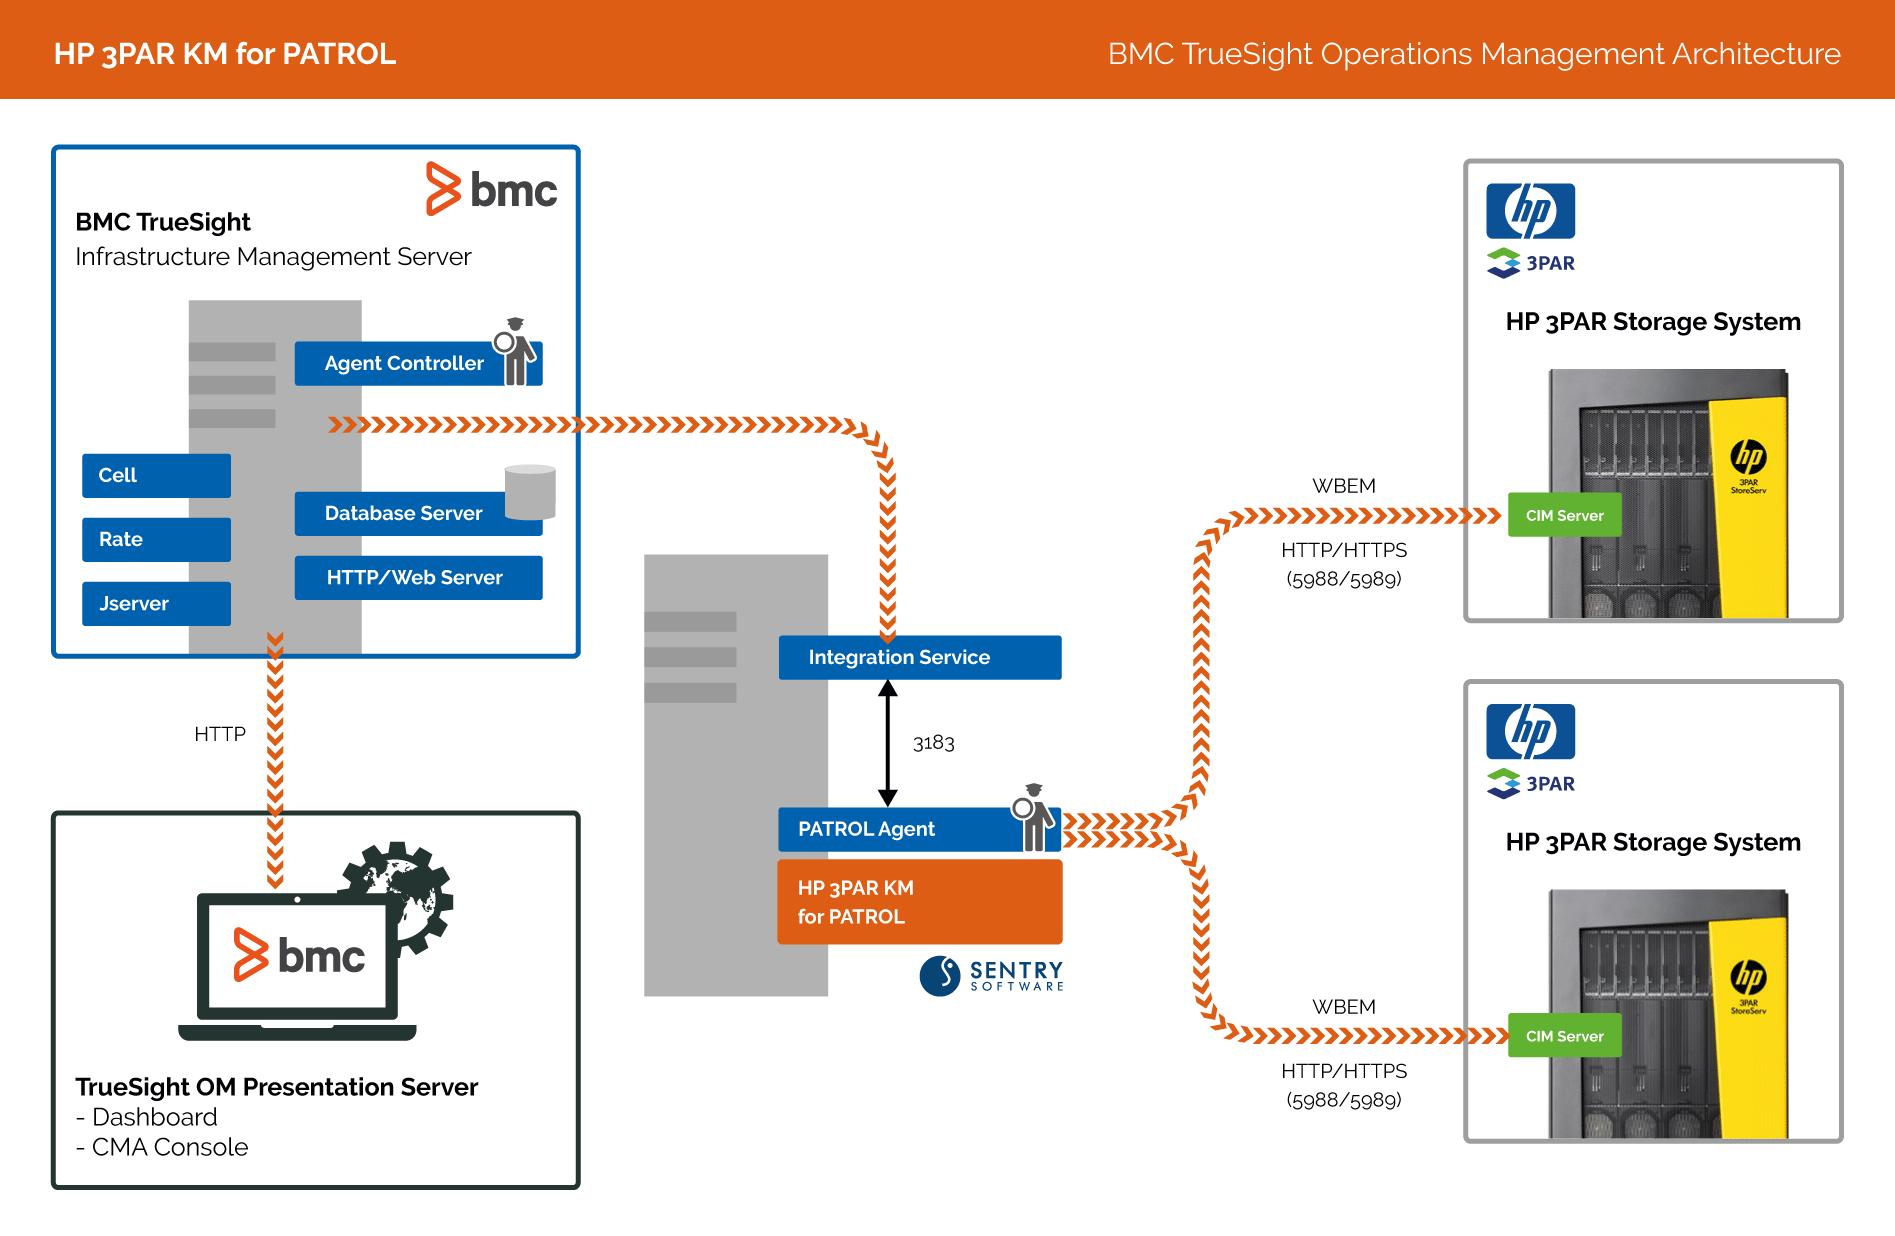 HP 3PAR KM | Sentry Software